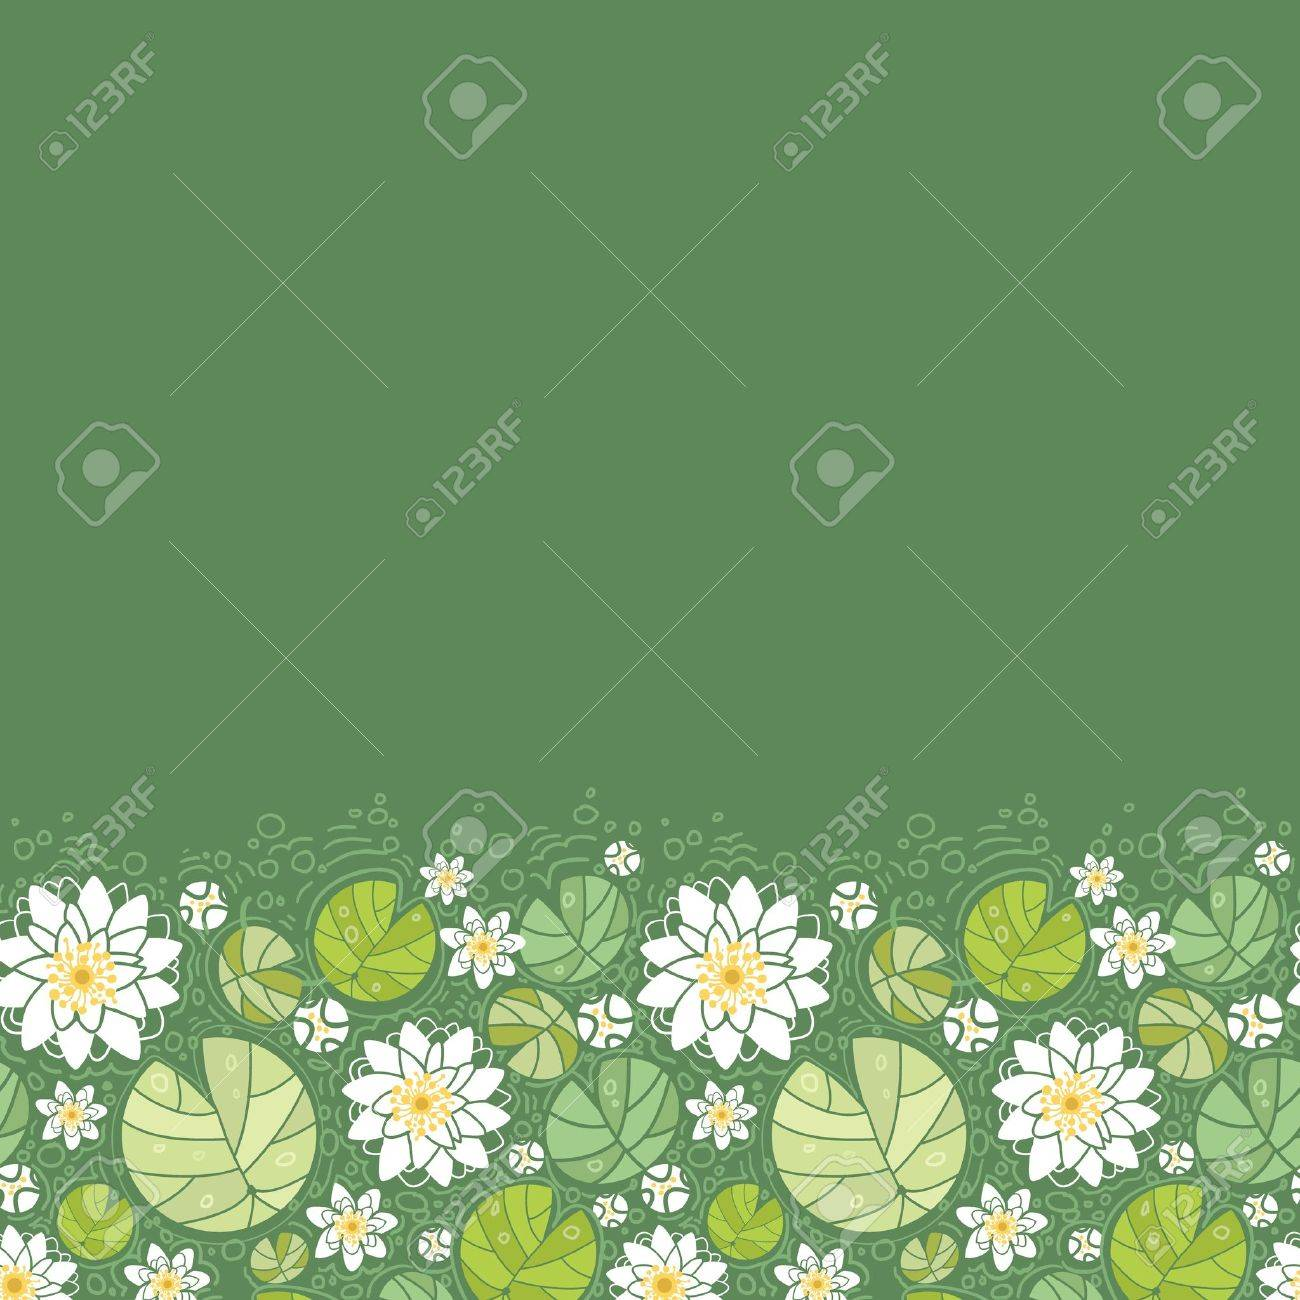 Water lillies horizontal seamless pattern background border Stock Vector - 16675683